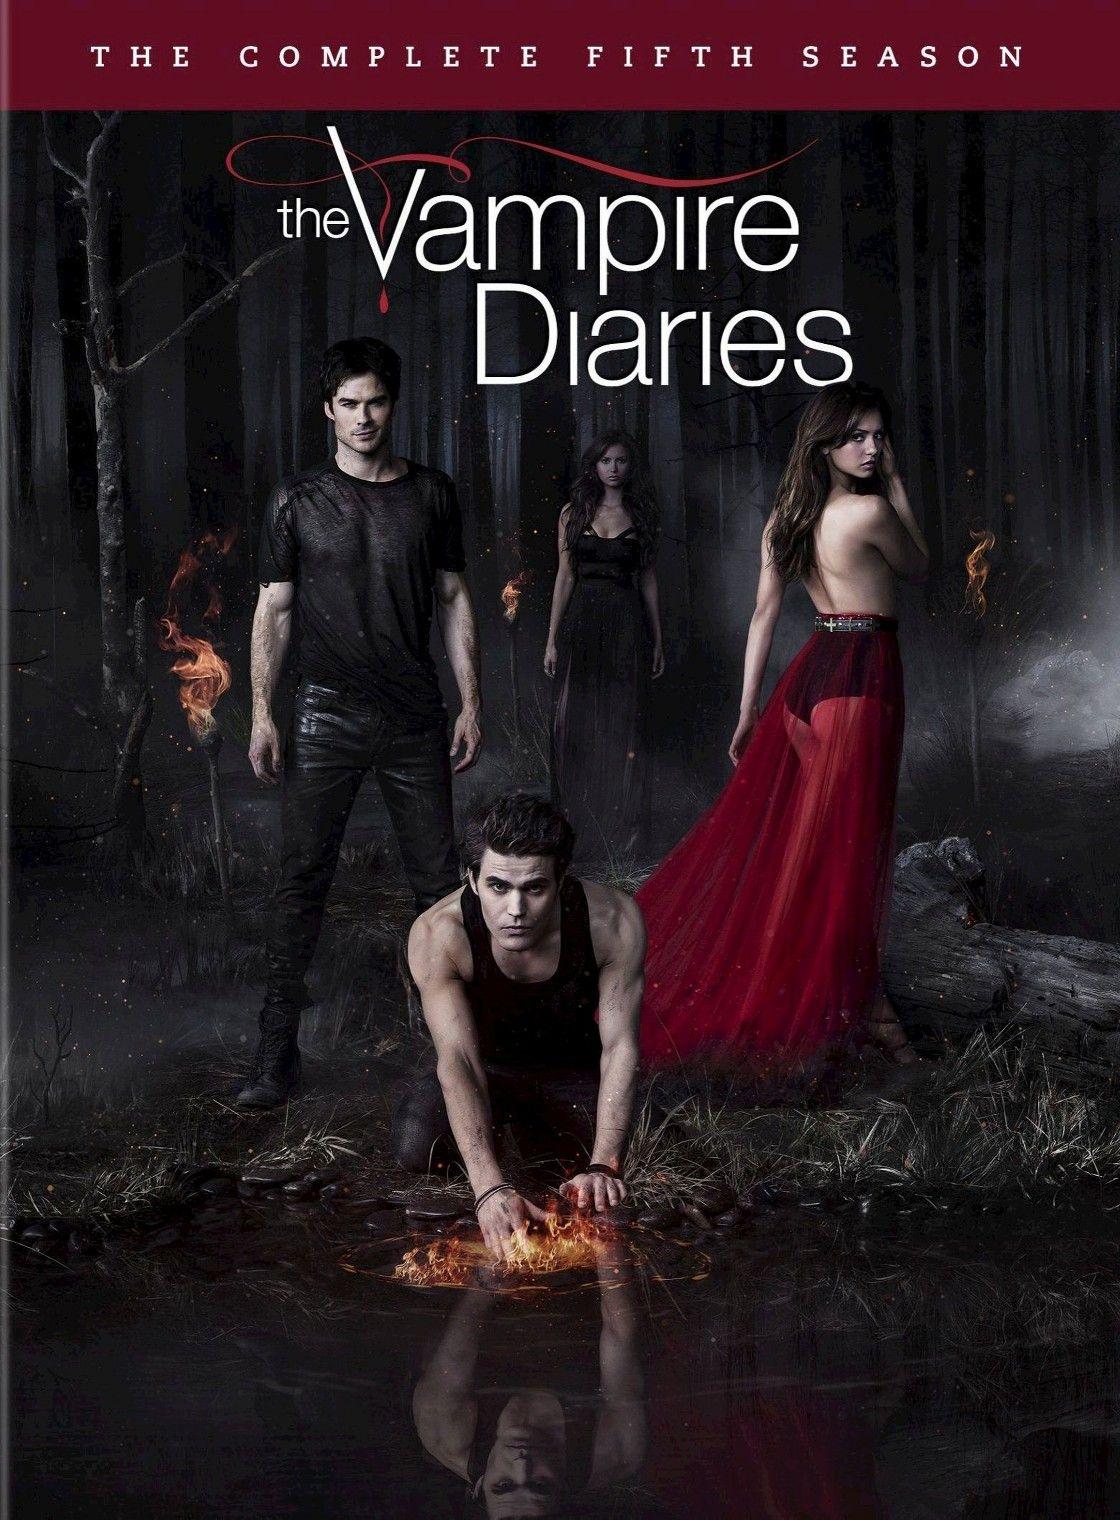 The Vampire Diaries The Complete Fifth Season 5 Discs Vampire